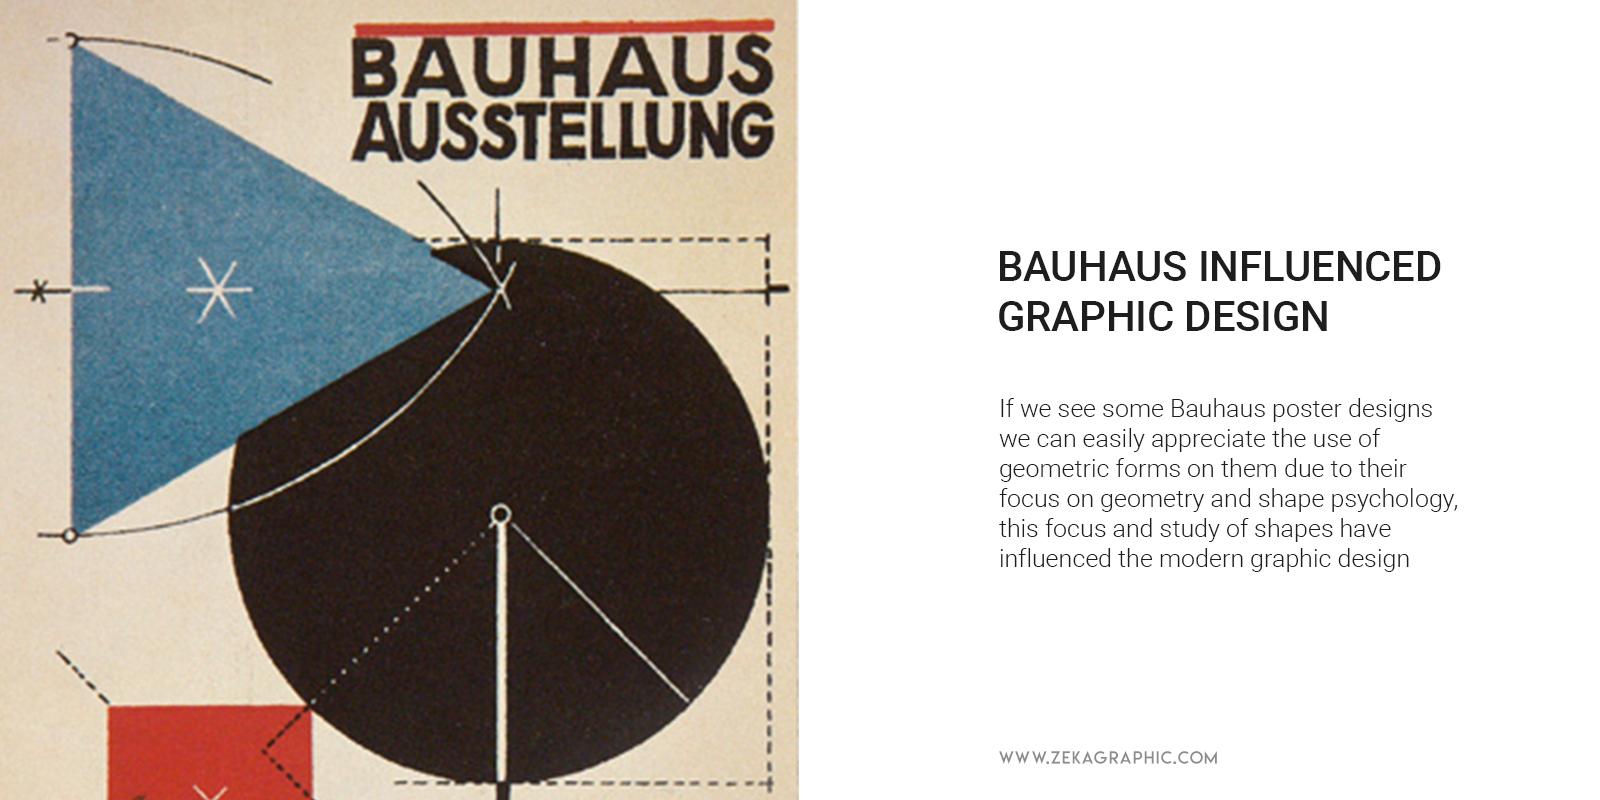 How Bauhaus influenced Graphic Design Geometric Shapes